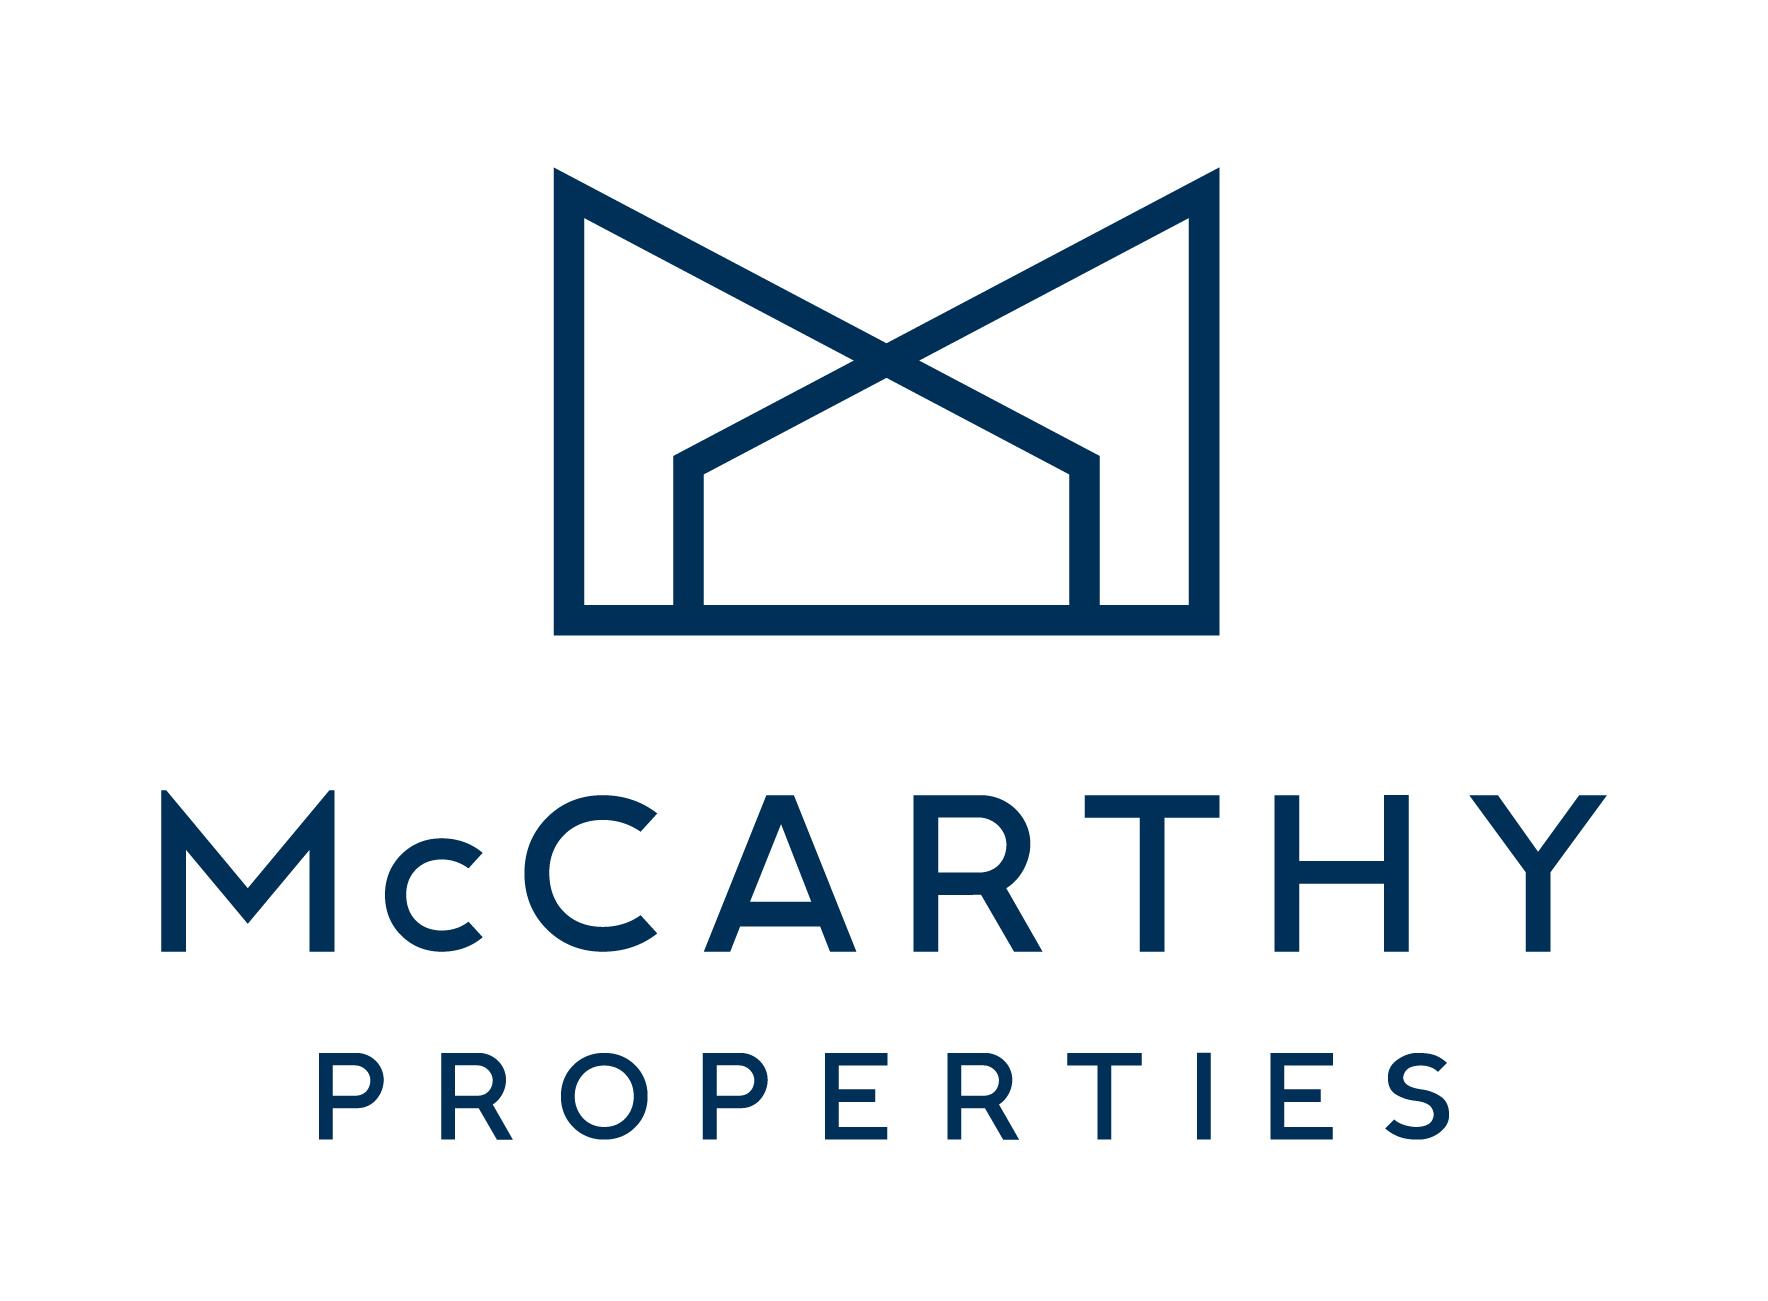 W.P.J. McCarthy and Company Ltd.